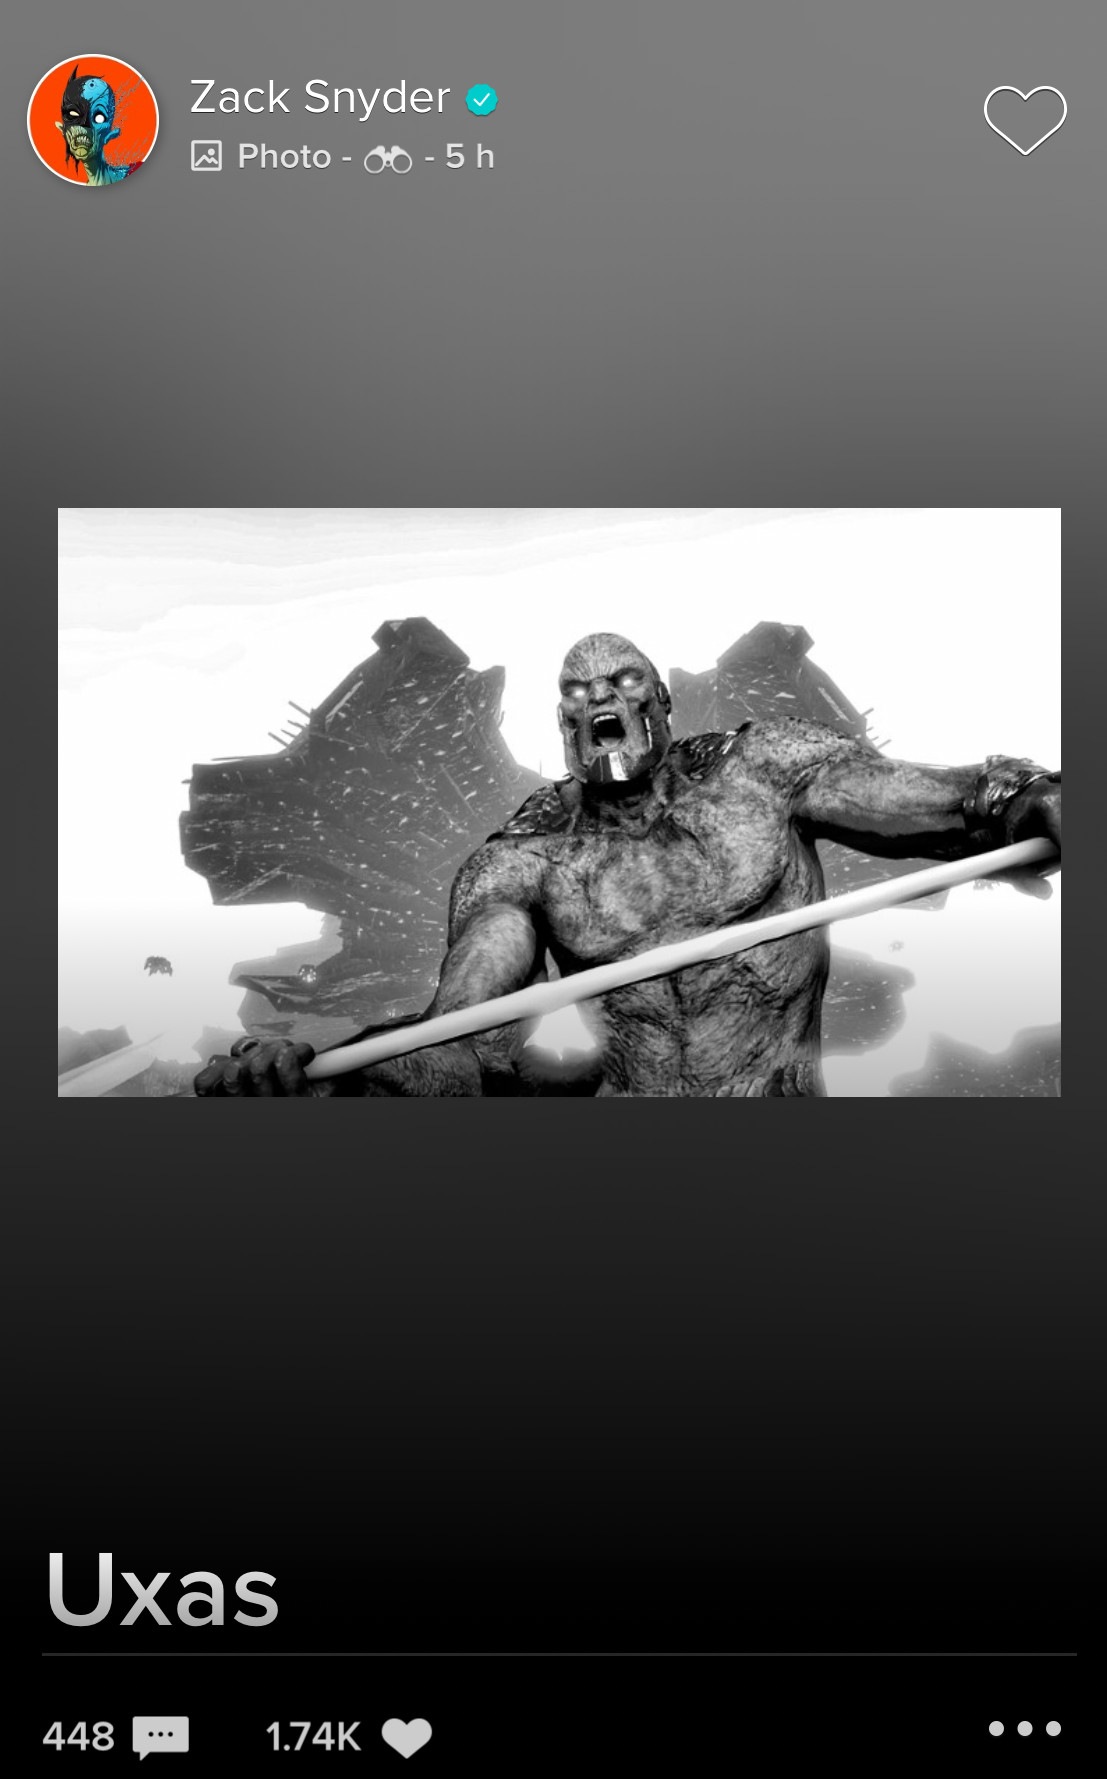 Zack Snyder Uxas Darkseid Justice League